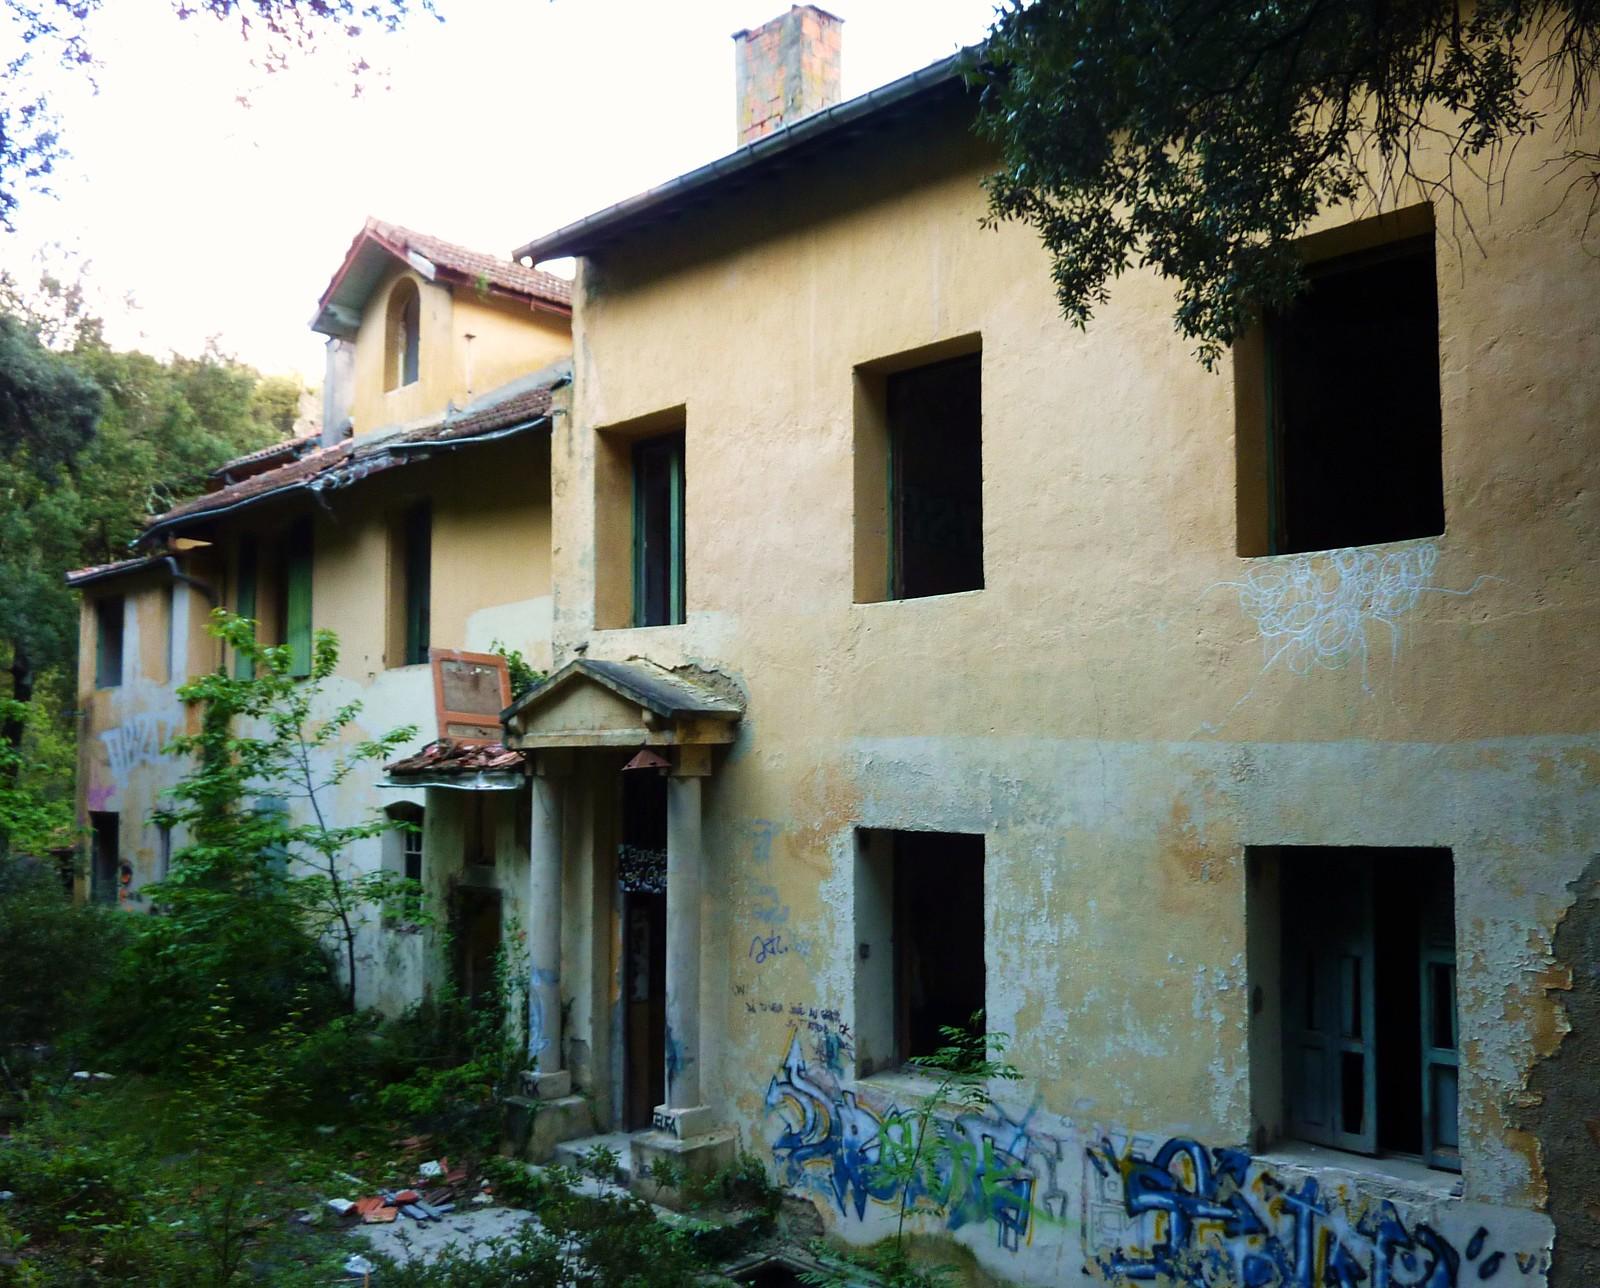 Fabuleux ancien hotel alexandra Vernet les bains | Flickr FR18